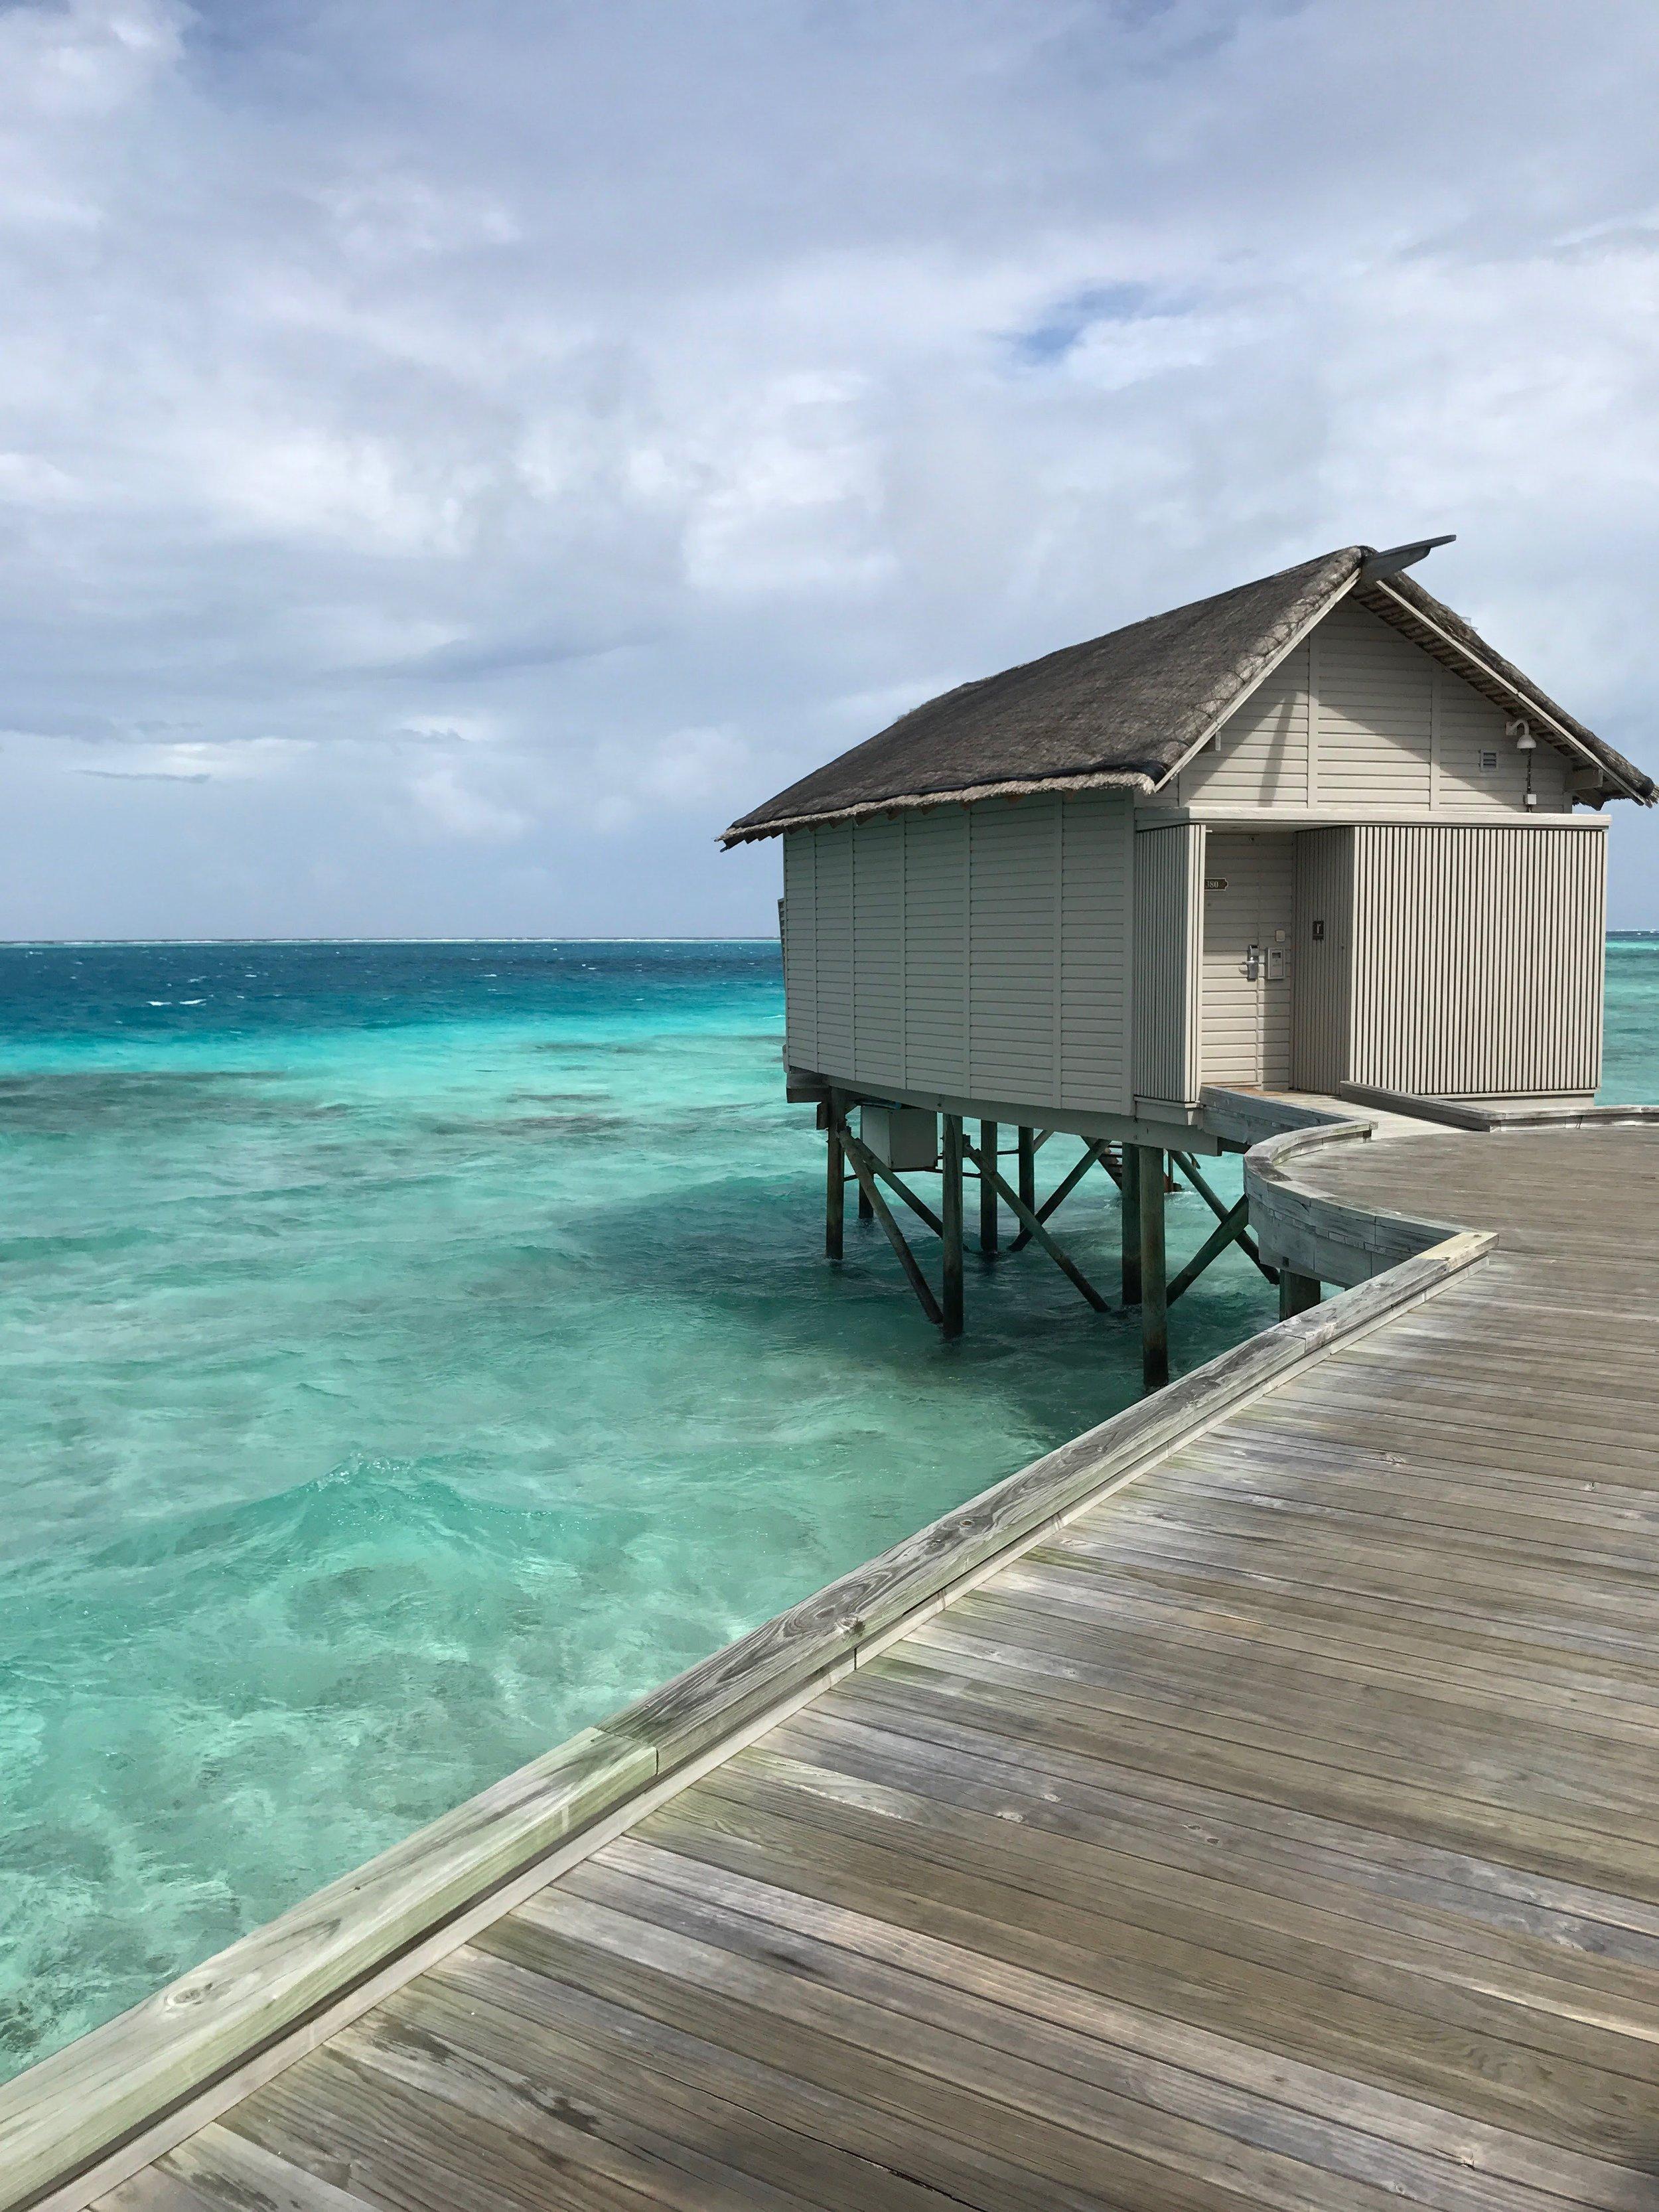 invite-to-paradise-maldives-sri-lanka-specialists-experts-travel-agent-tour-operator-customer-feedback-lucas-emily-fenning-elephant-orphanage-centara-ras-fushi-water-villa.jpg